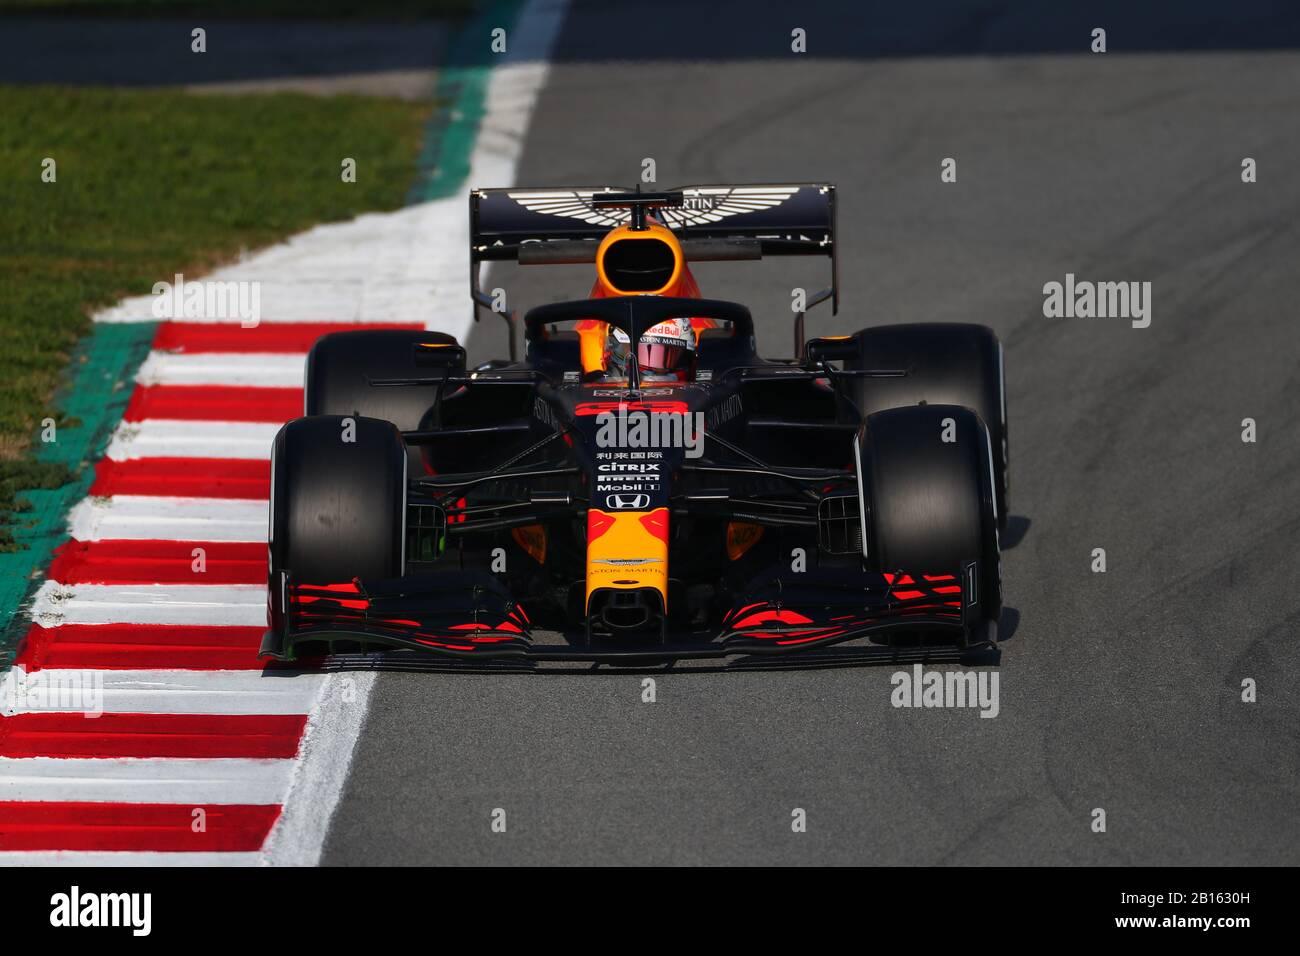 33 Max Verstappen Aston Martin Red Bull Racing Honda Formula 1 World Championship 2020 Winter Testing Days 1 2020 Barcelona 19 21 February 2020 Stock Photo Alamy